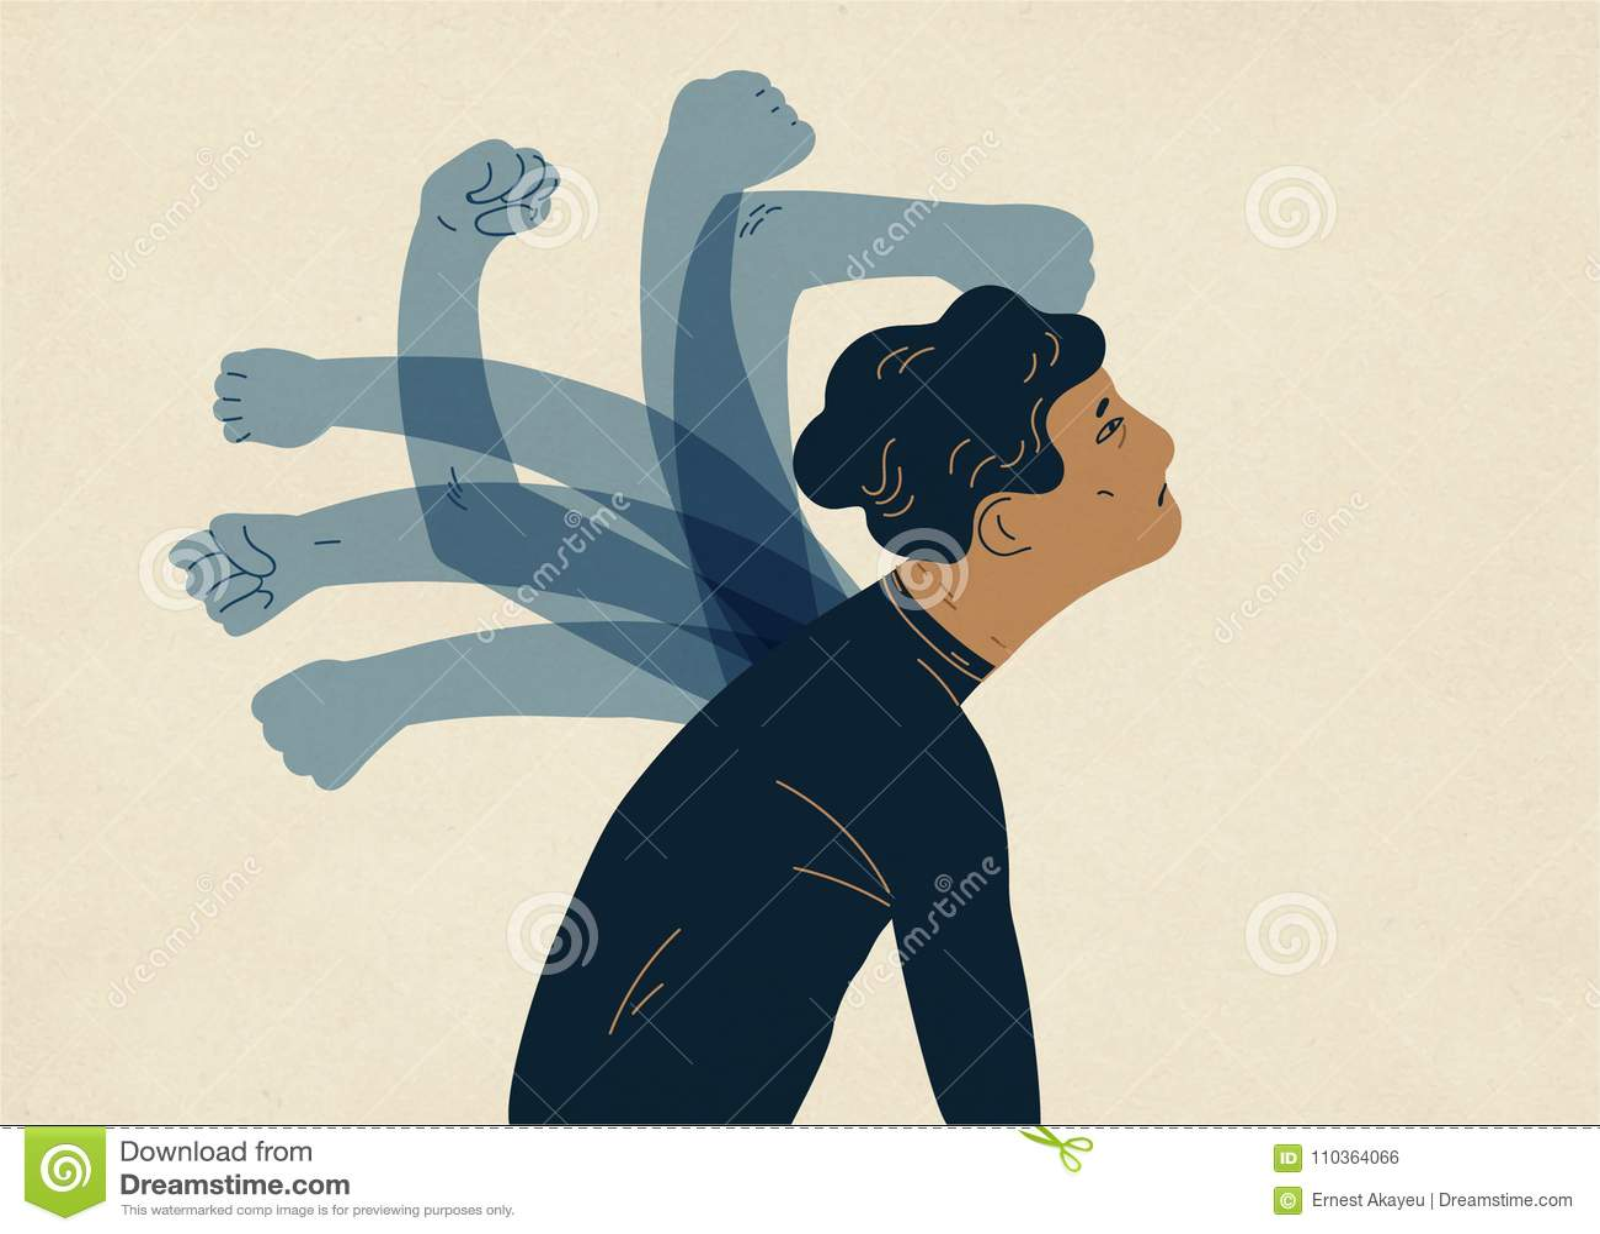 Translucent ghostly hands beating man. Concept of psychological self-flagellation, self-punishment, self-abasement, self